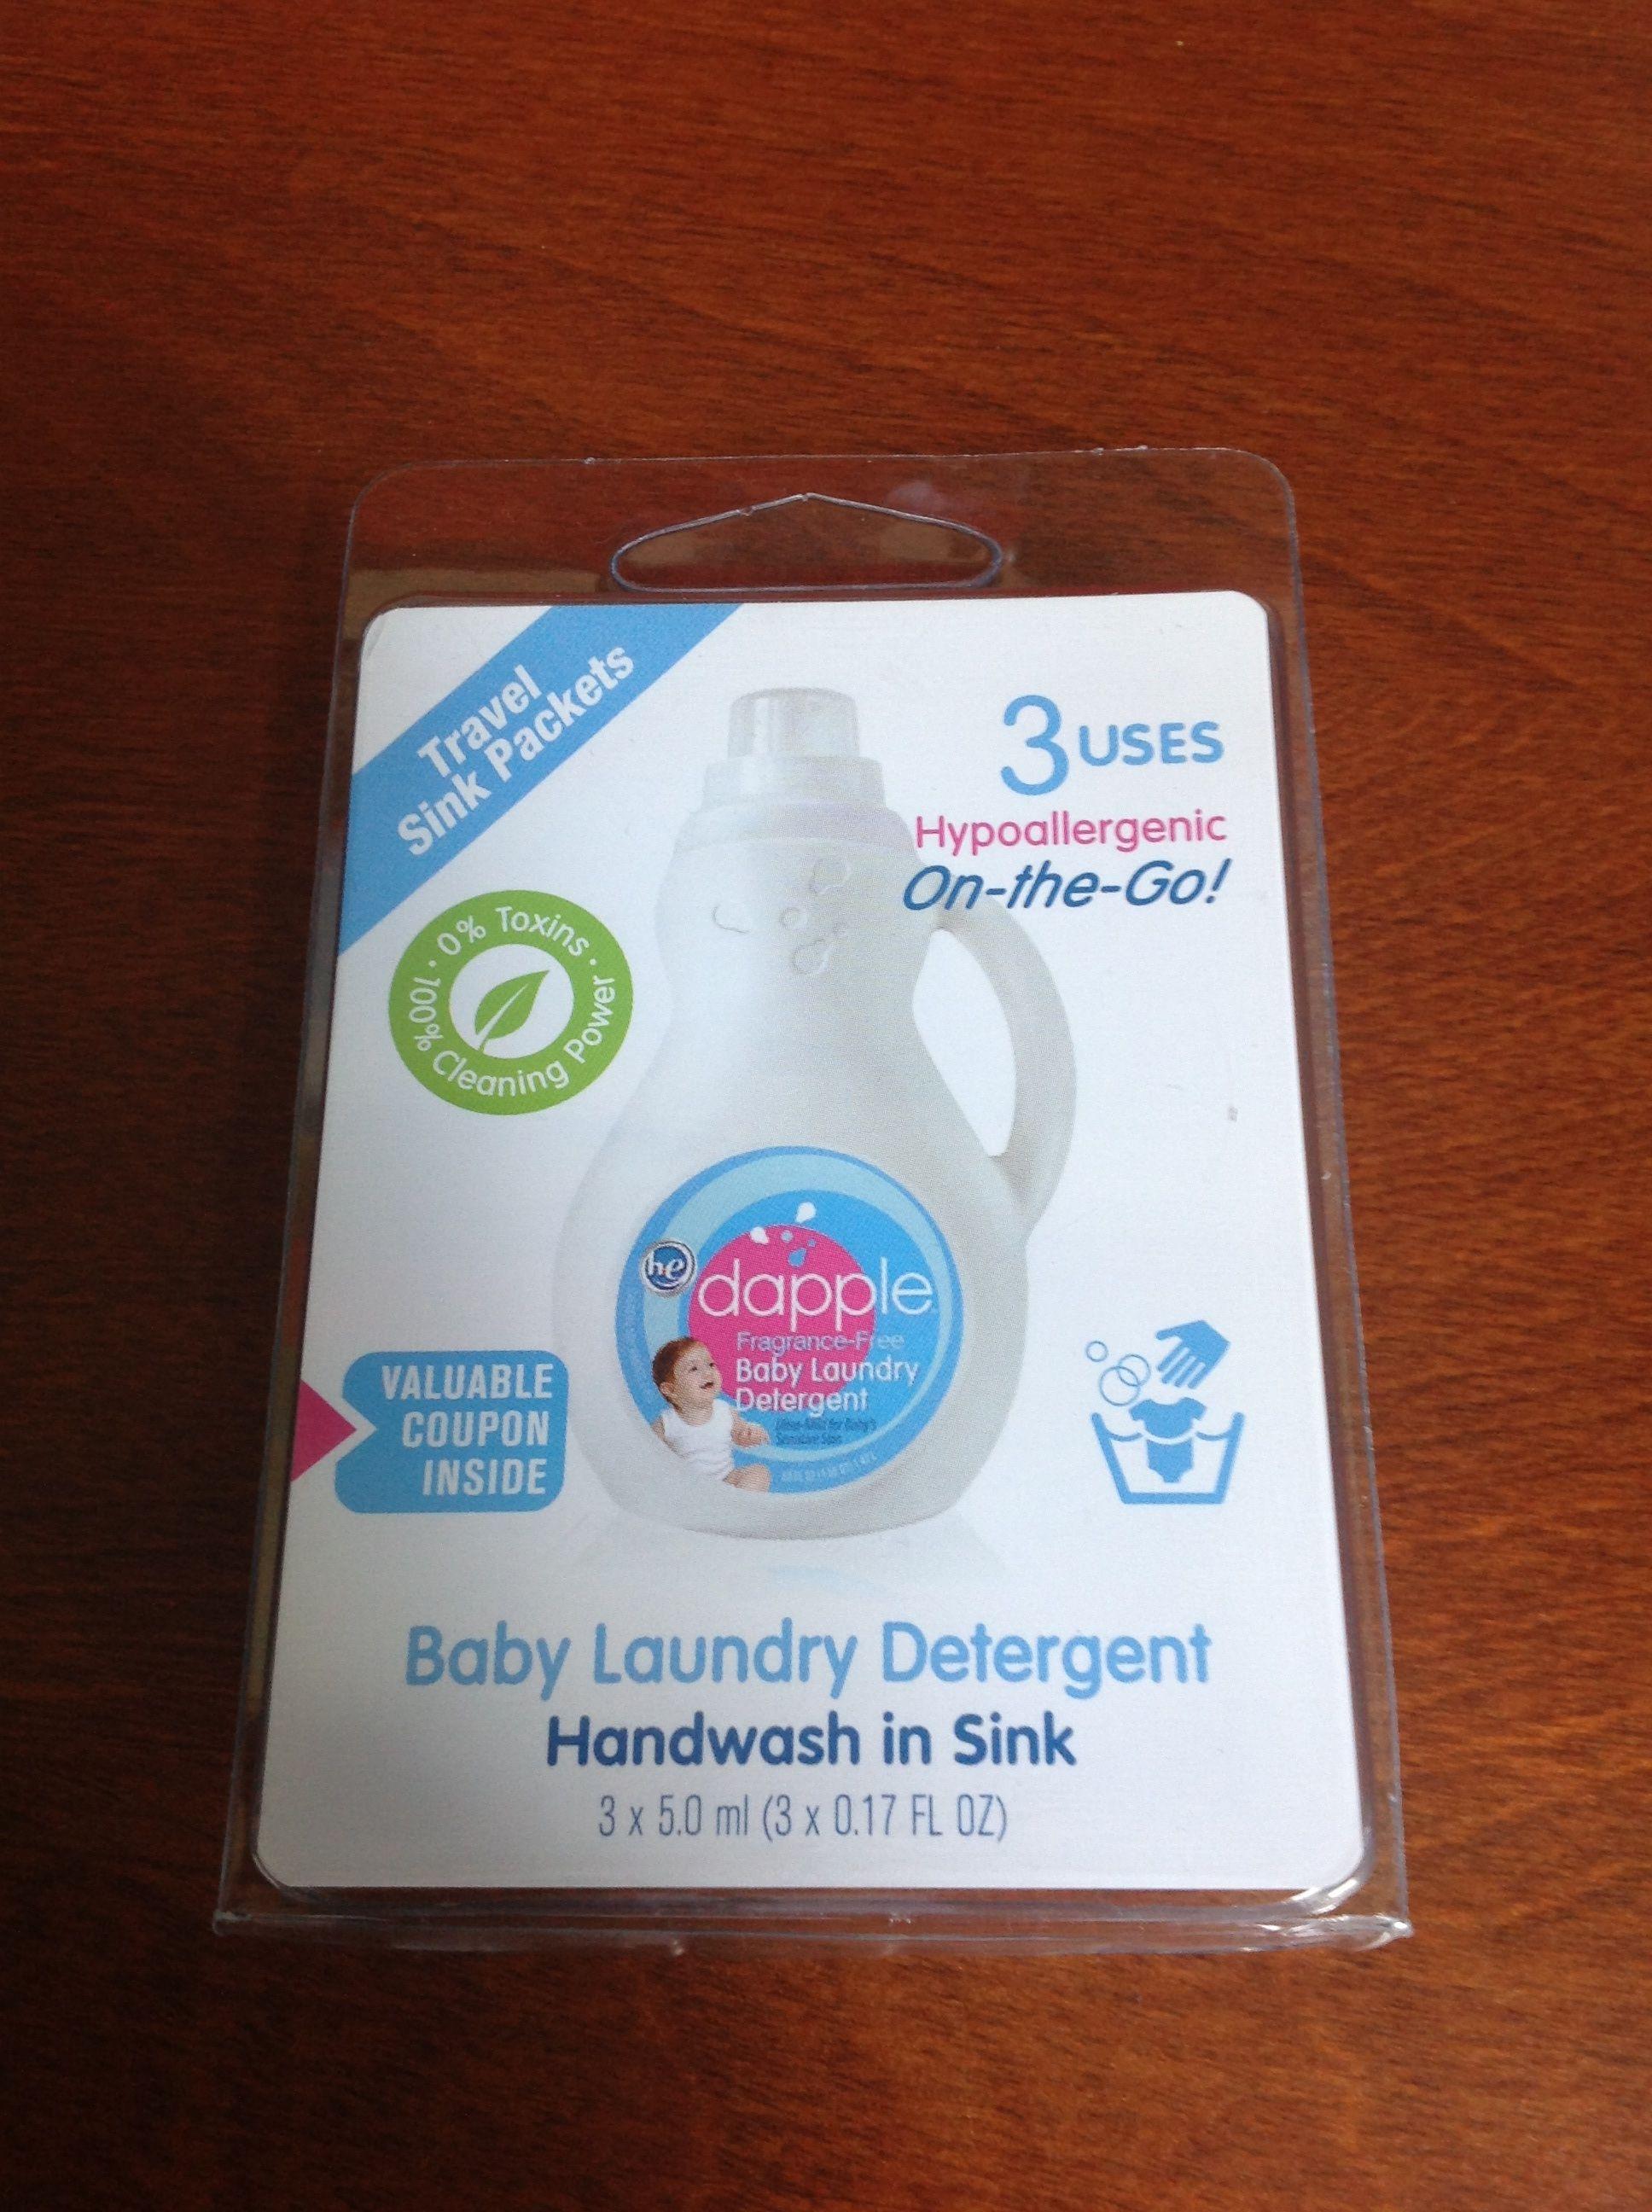 Dapple laundry detergent samples